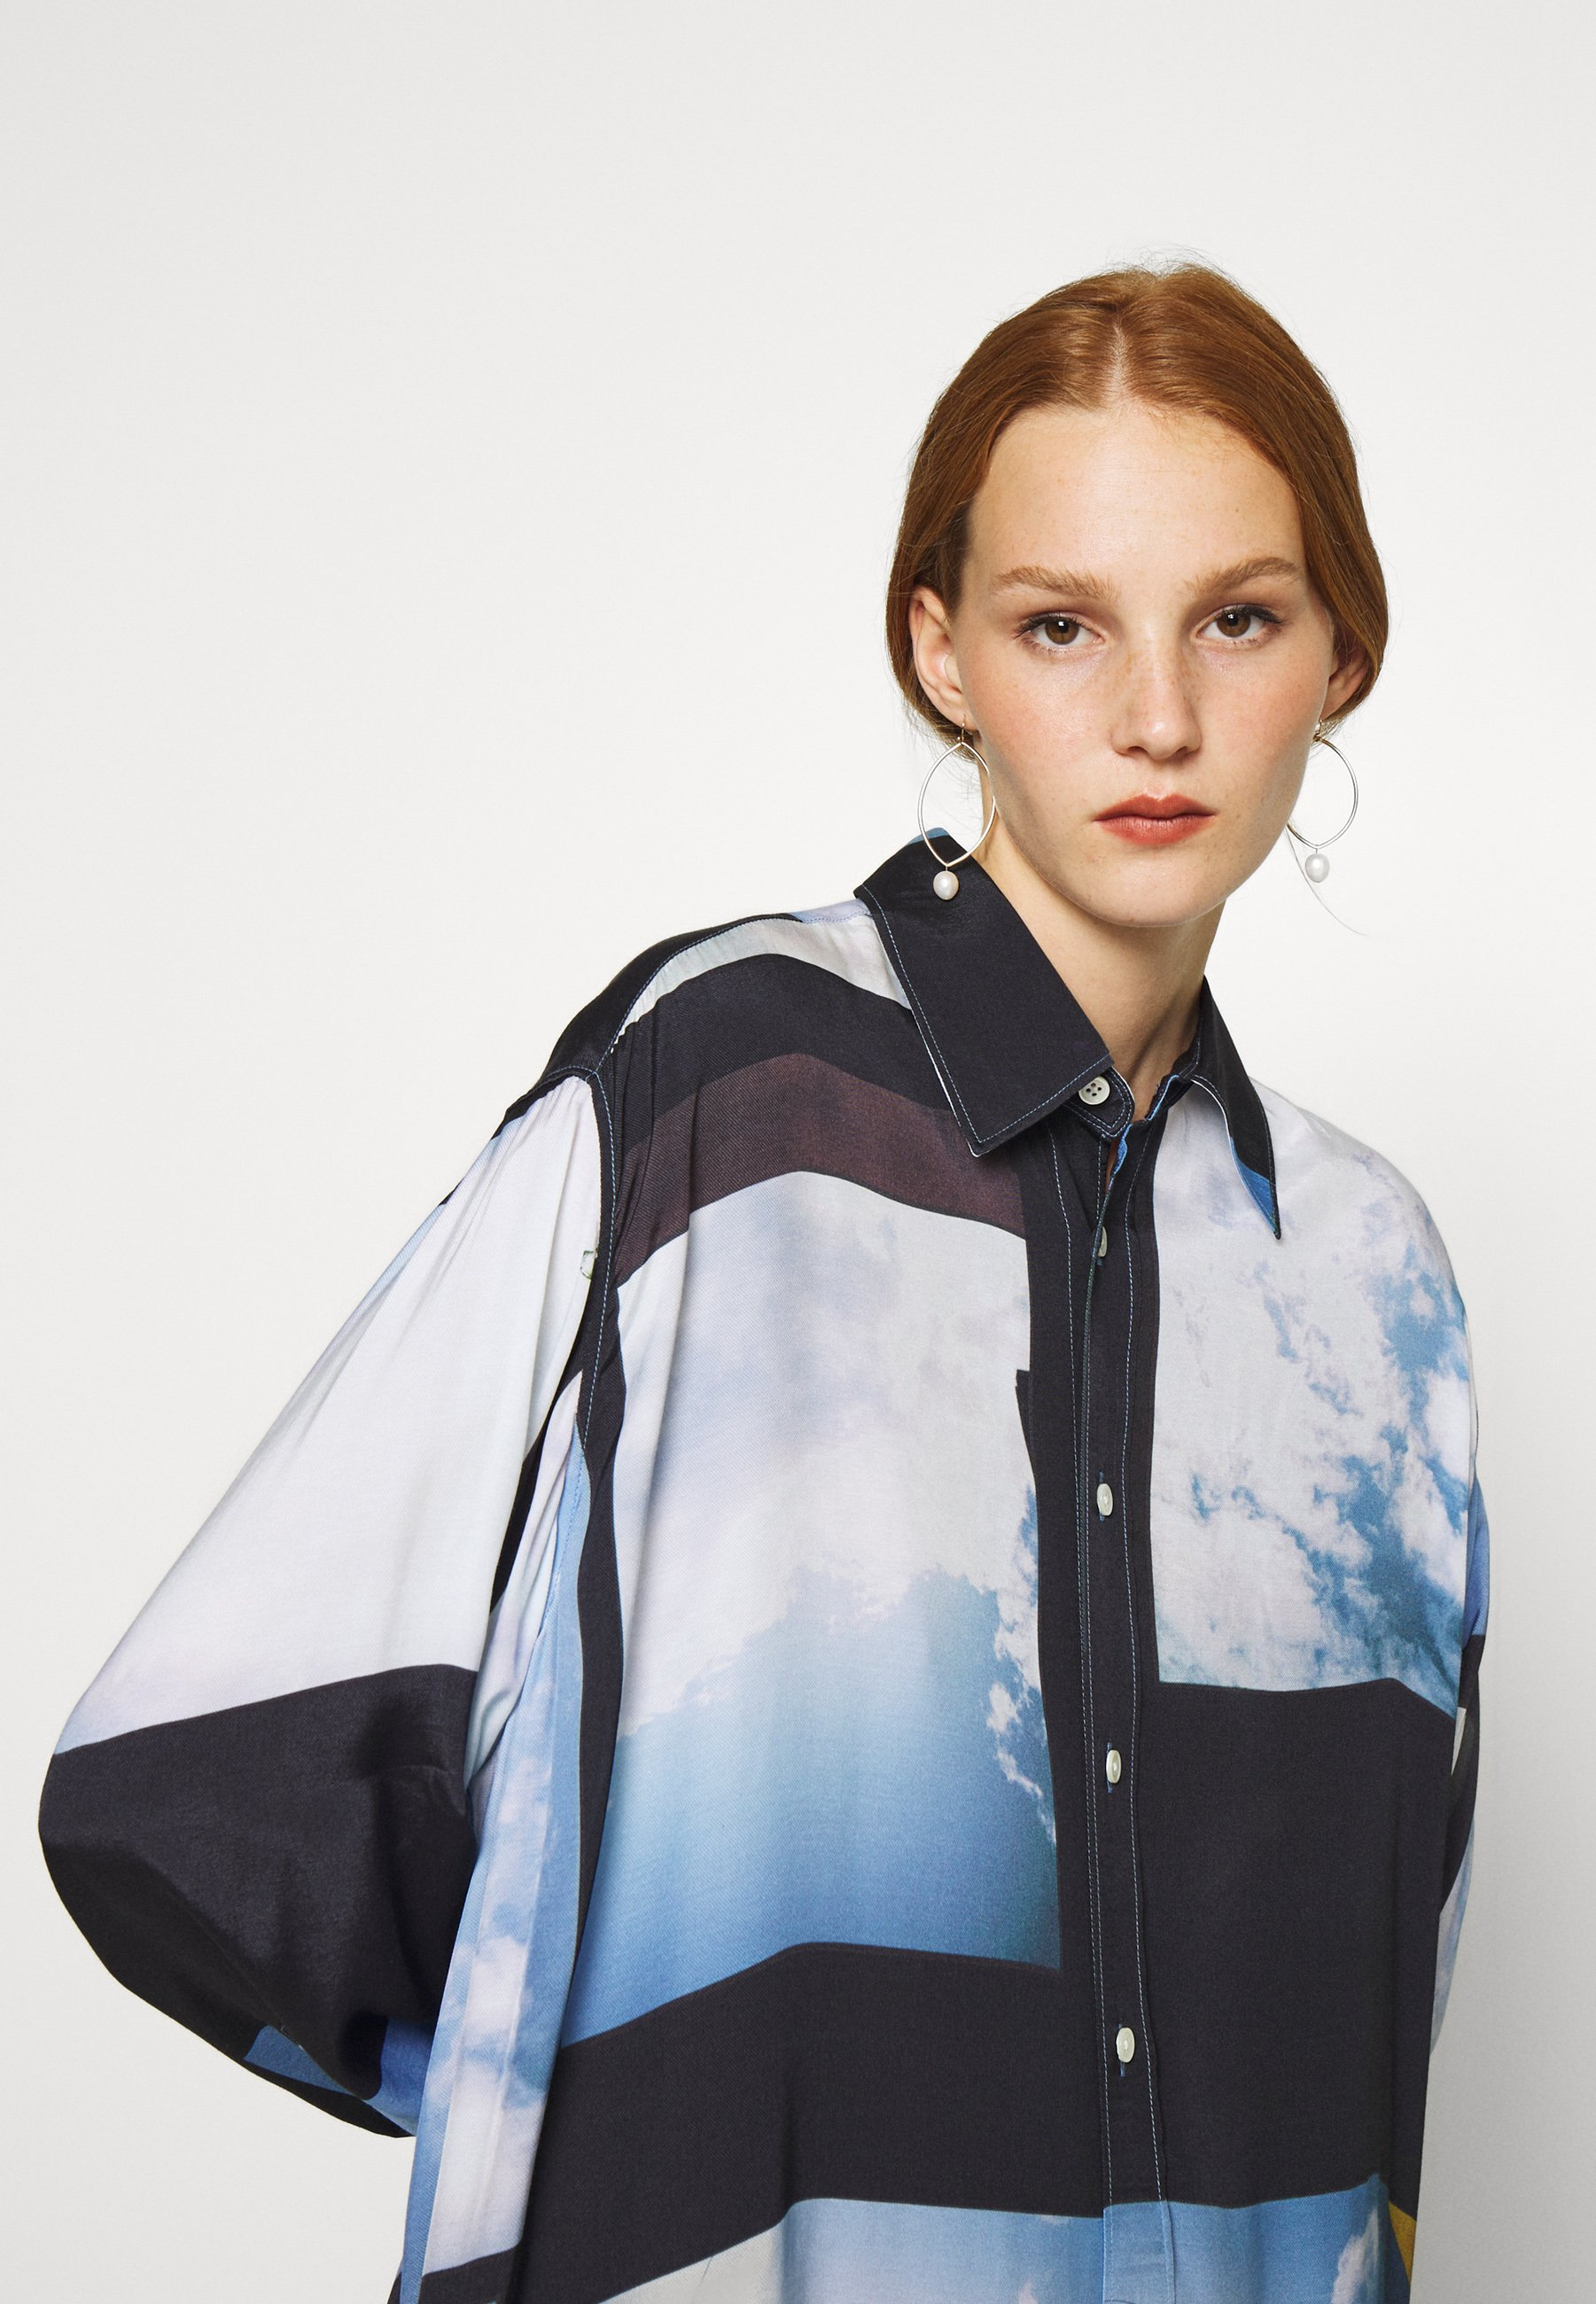 Exclusive Women's Clothing Hope FREE Button-down blouse heaven blue xkCxQE86g